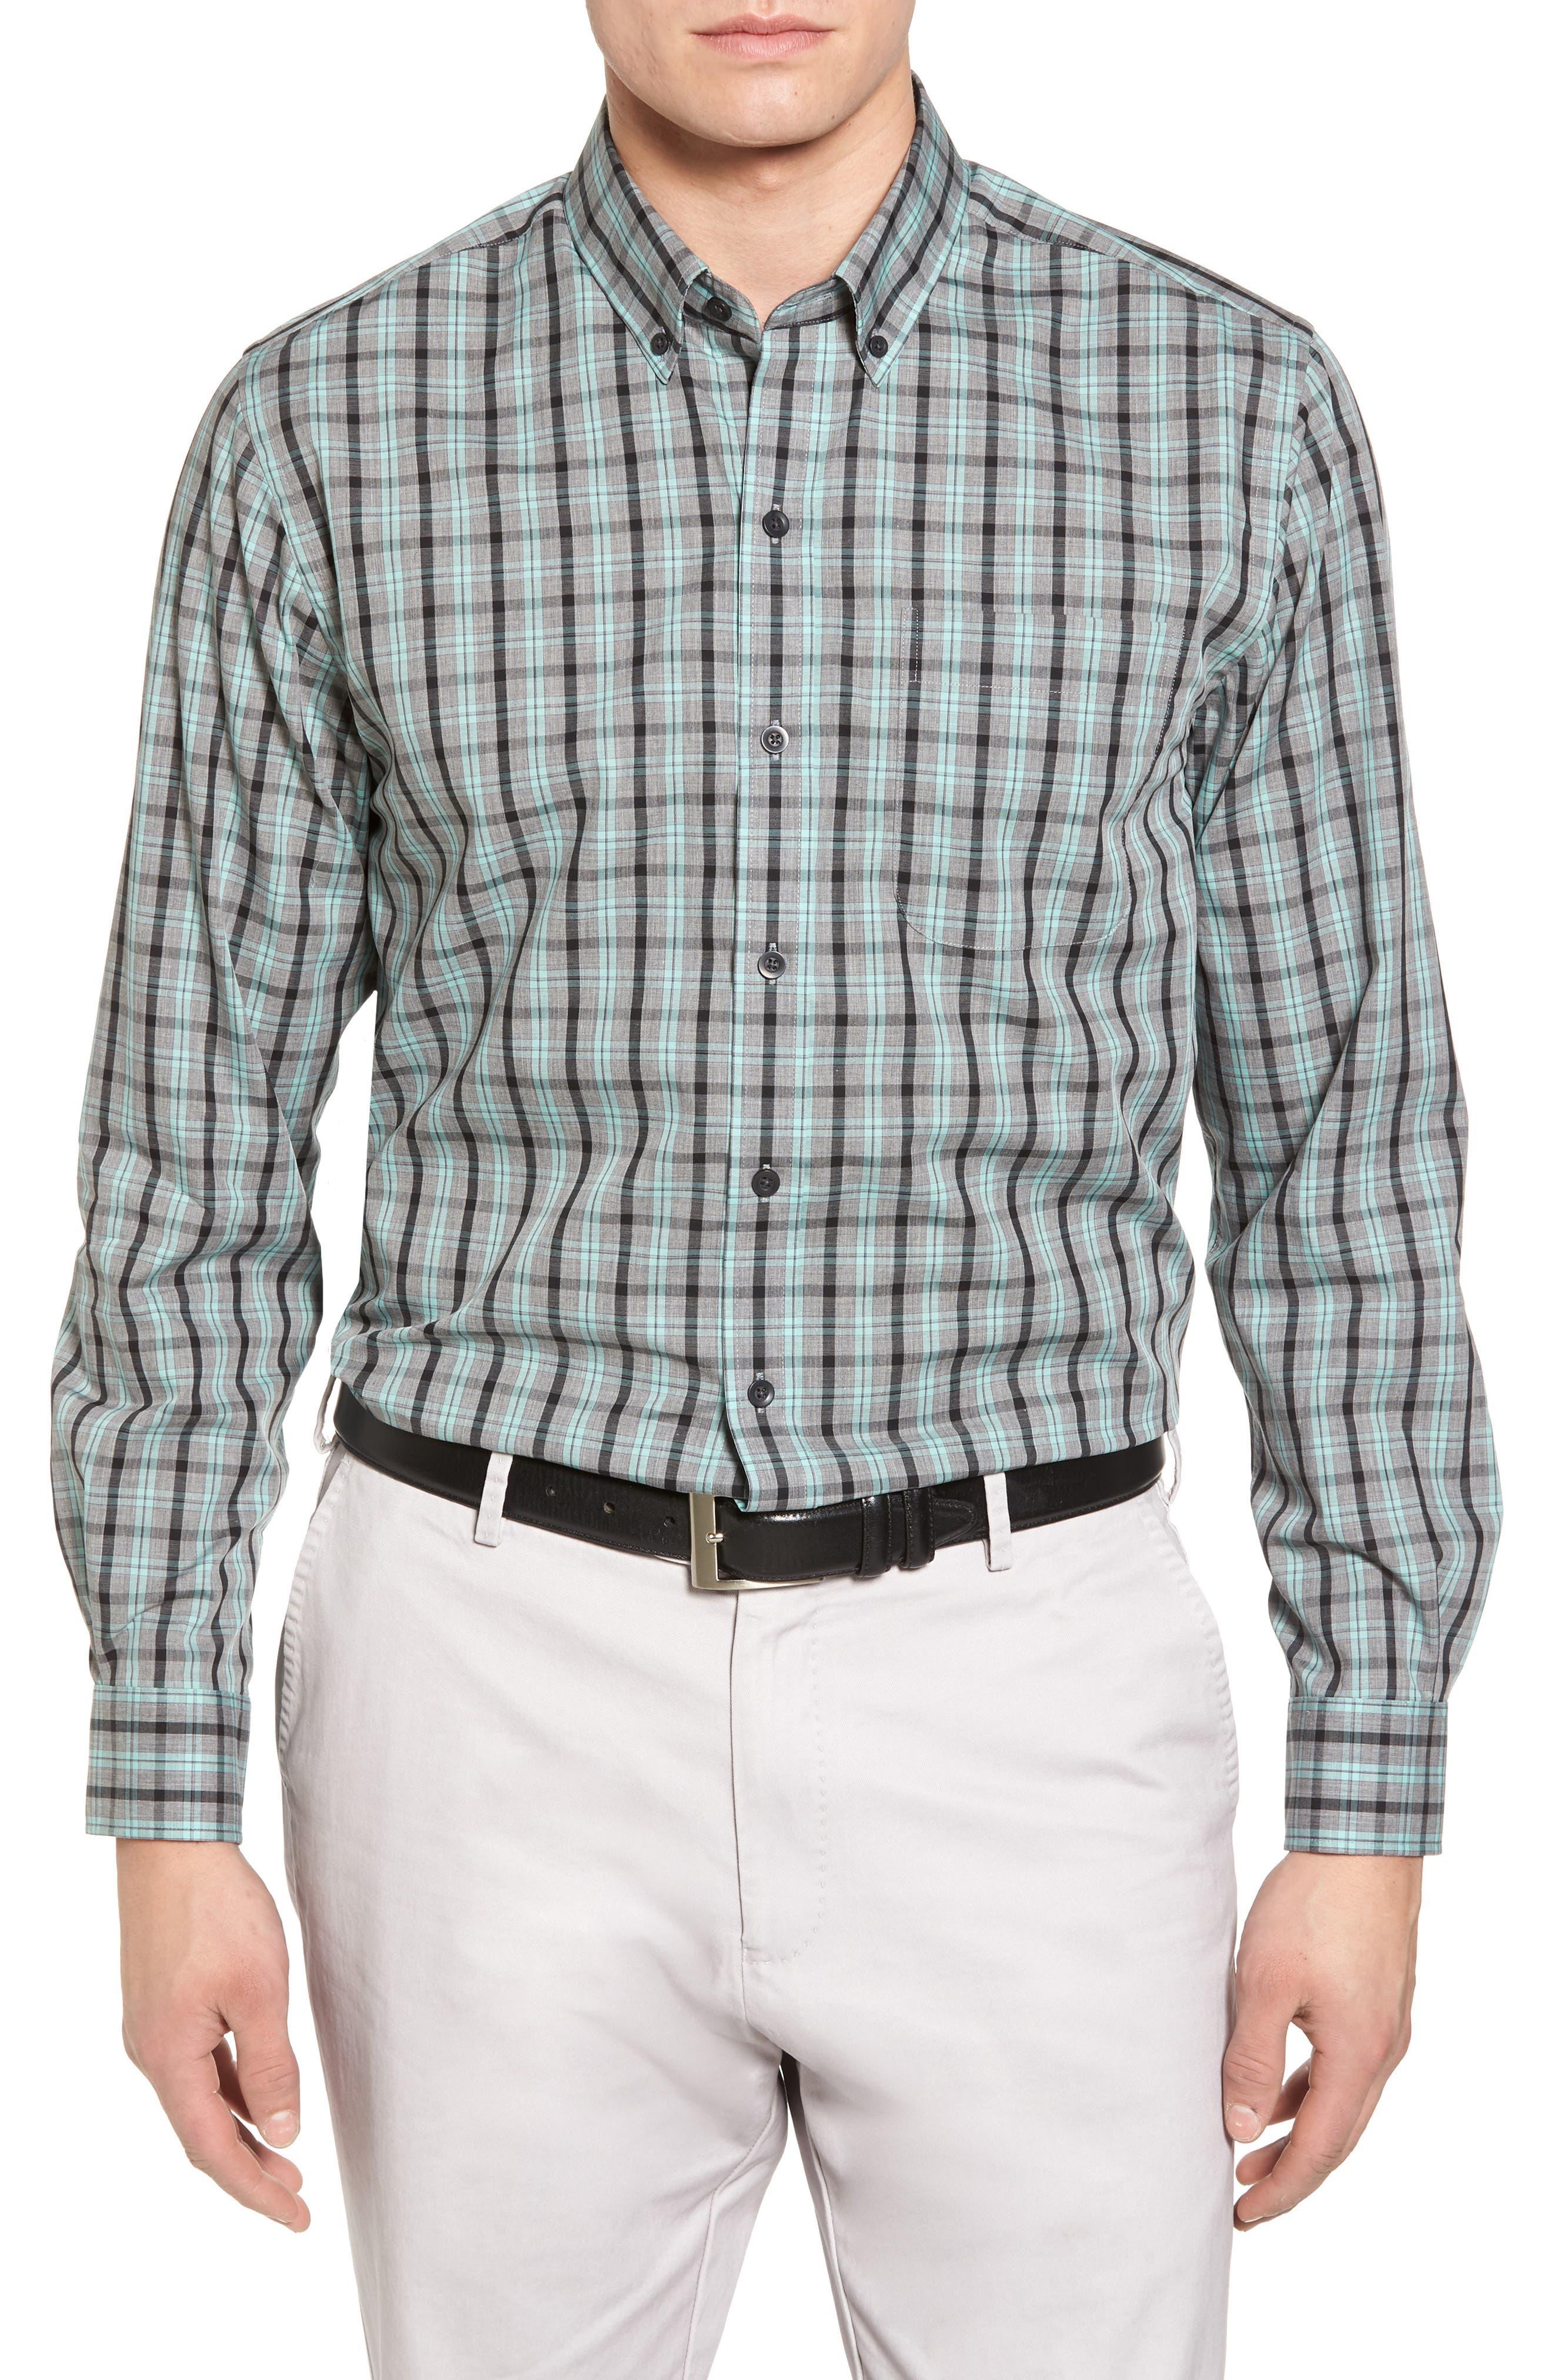 Davis Non-Iron Plaid Sport Shirt,                         Main,                         color, 300